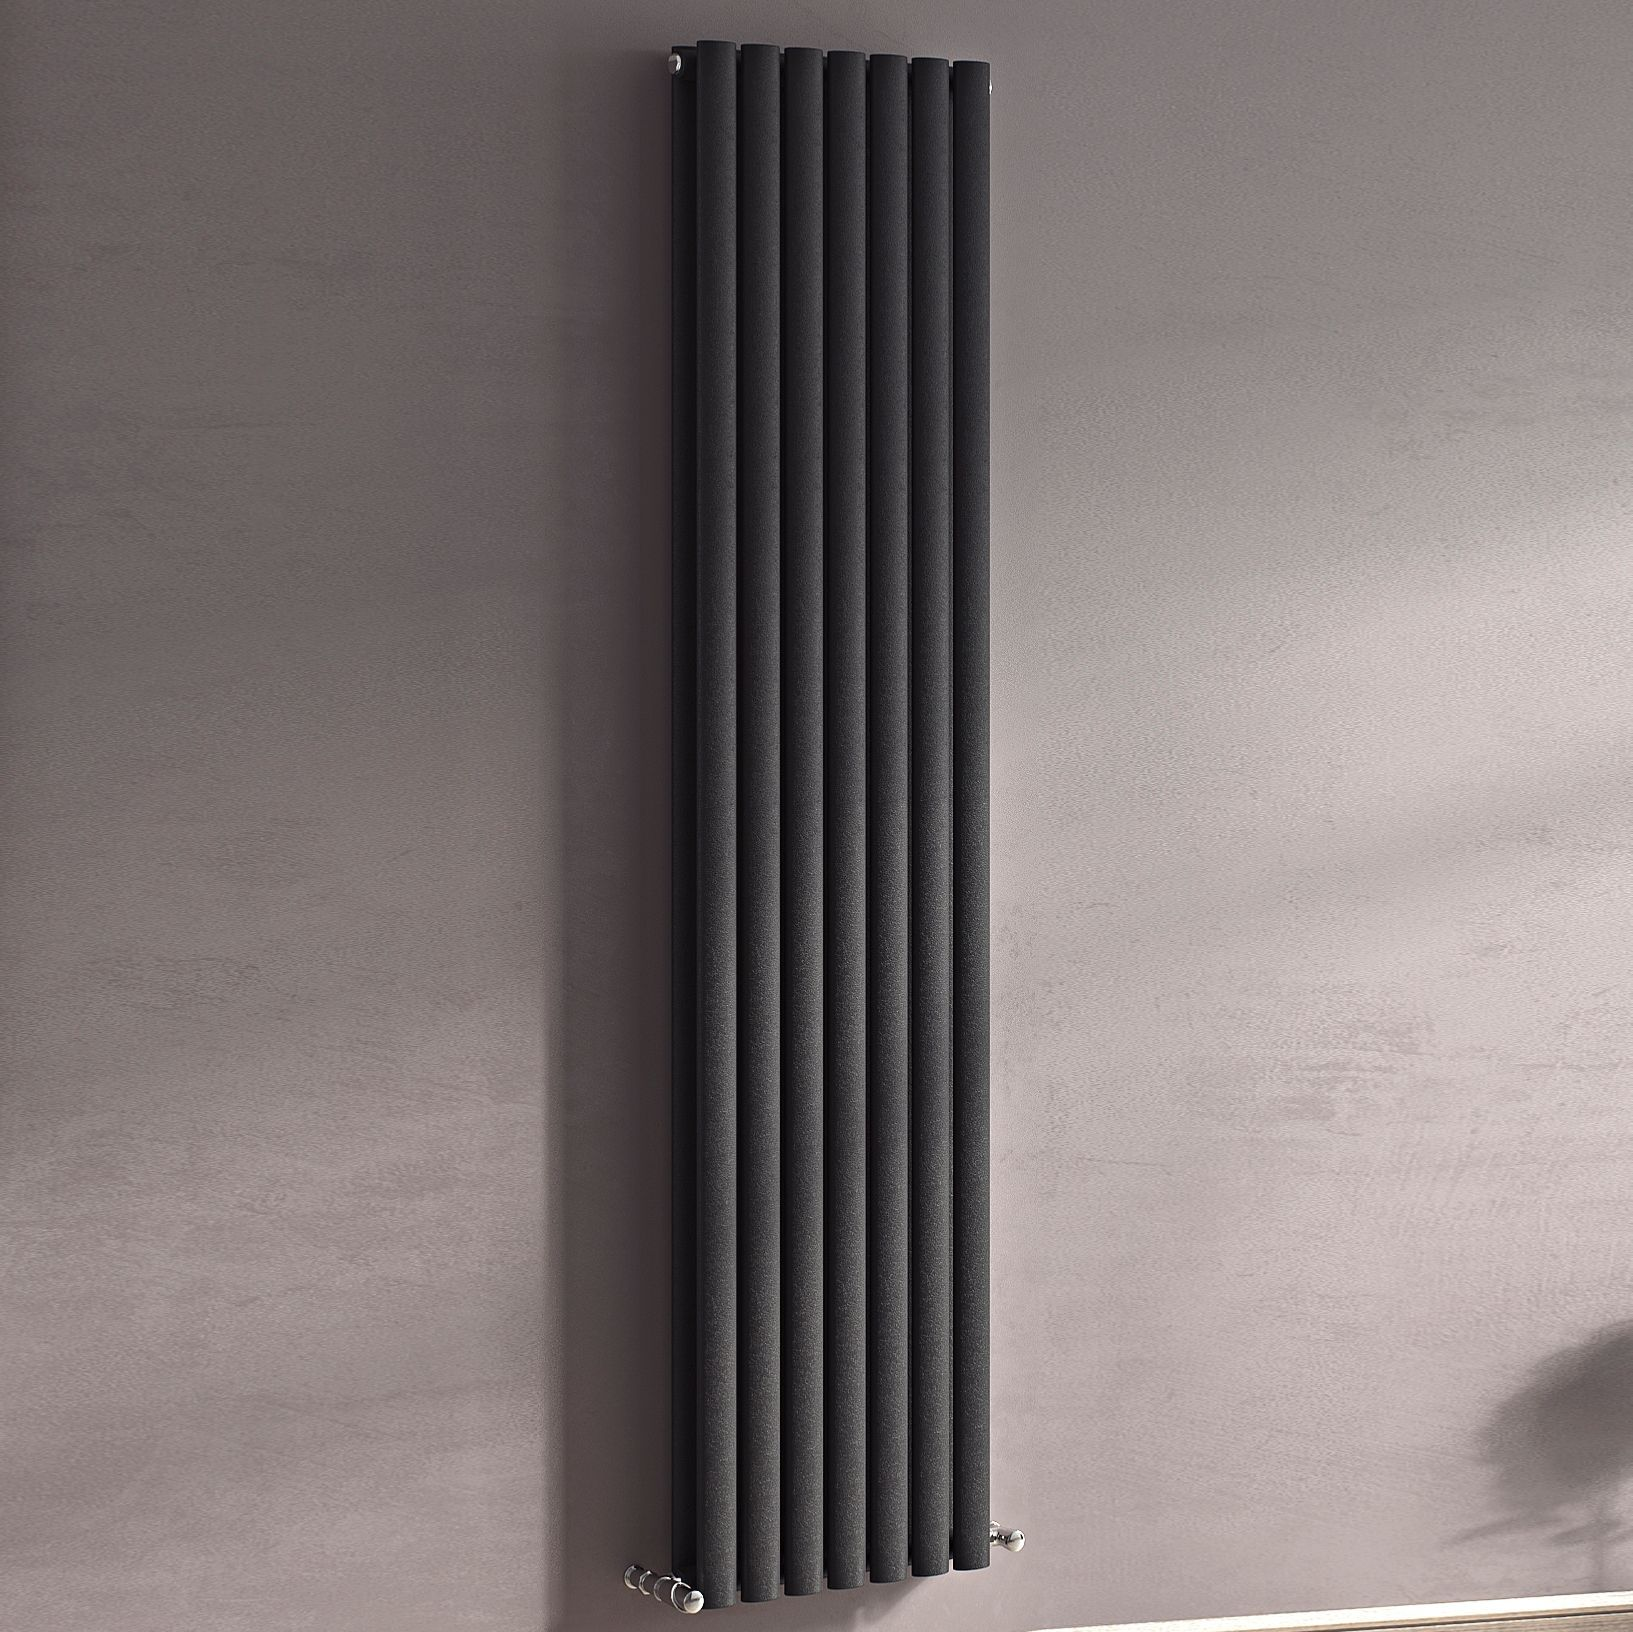 ximax champion vertical radiator anthracite h 1800 mm w. Black Bedroom Furniture Sets. Home Design Ideas